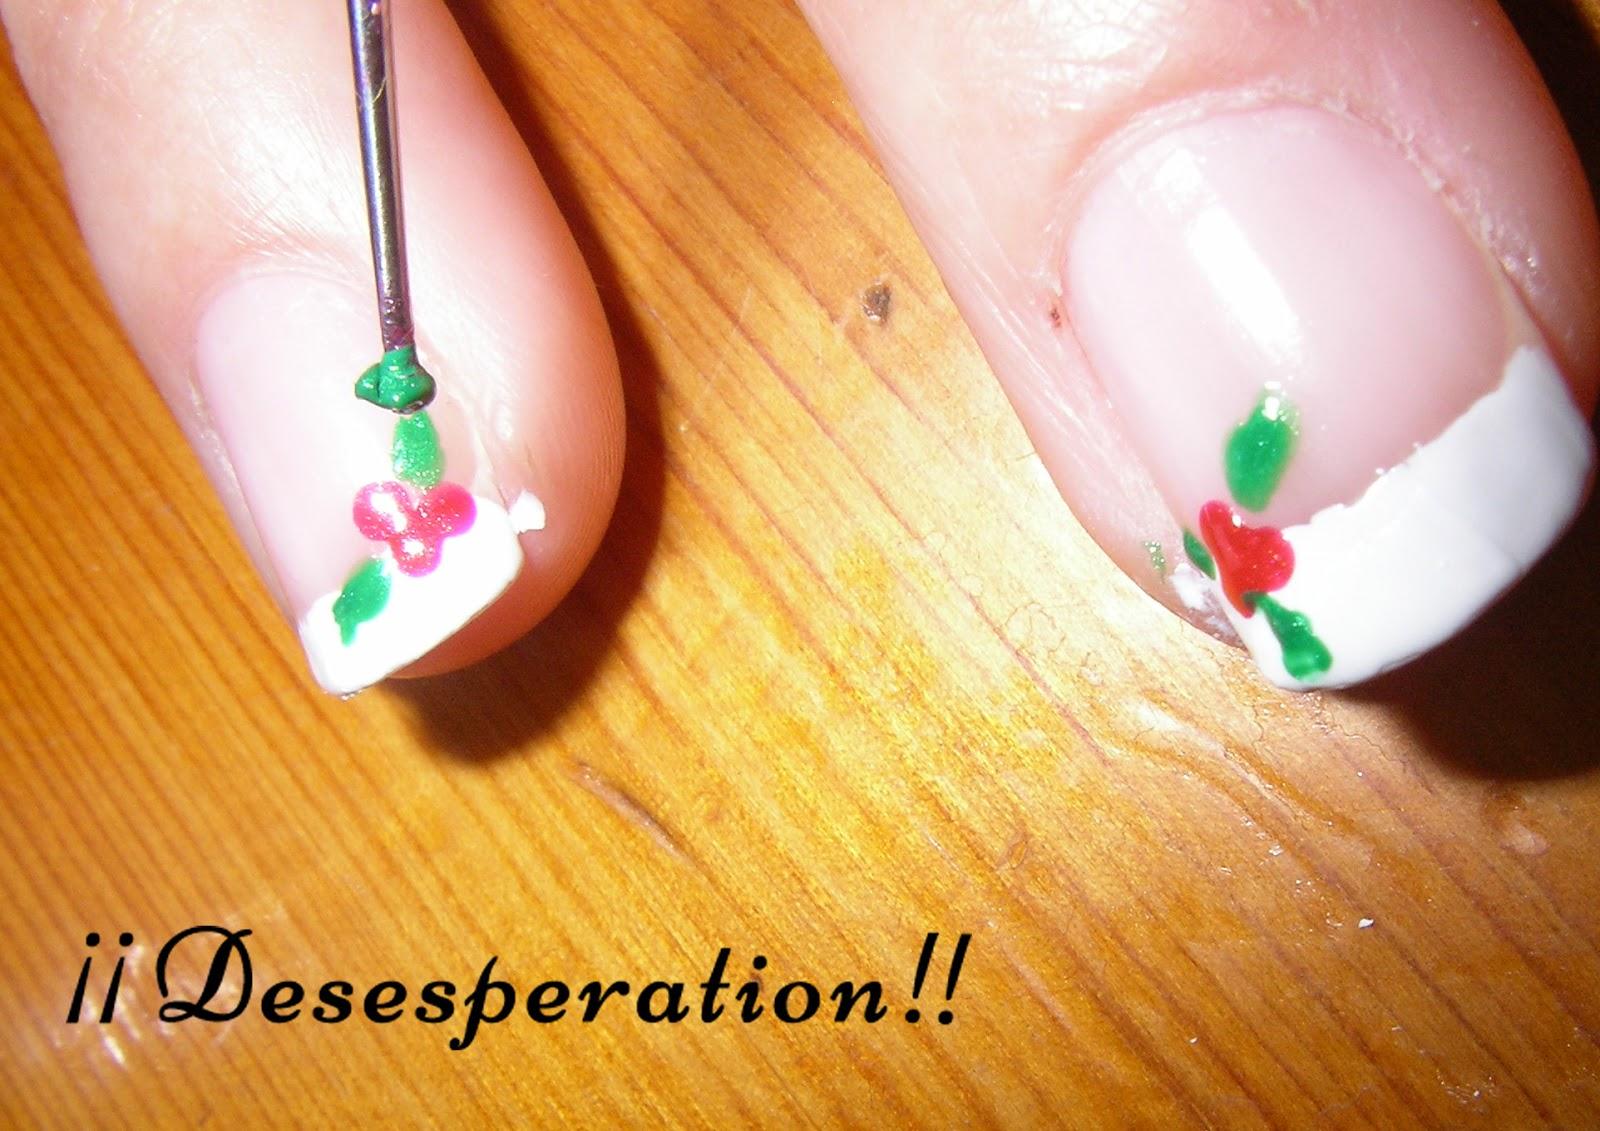 Desesperation!!: Diseño uñas - Acebo nails